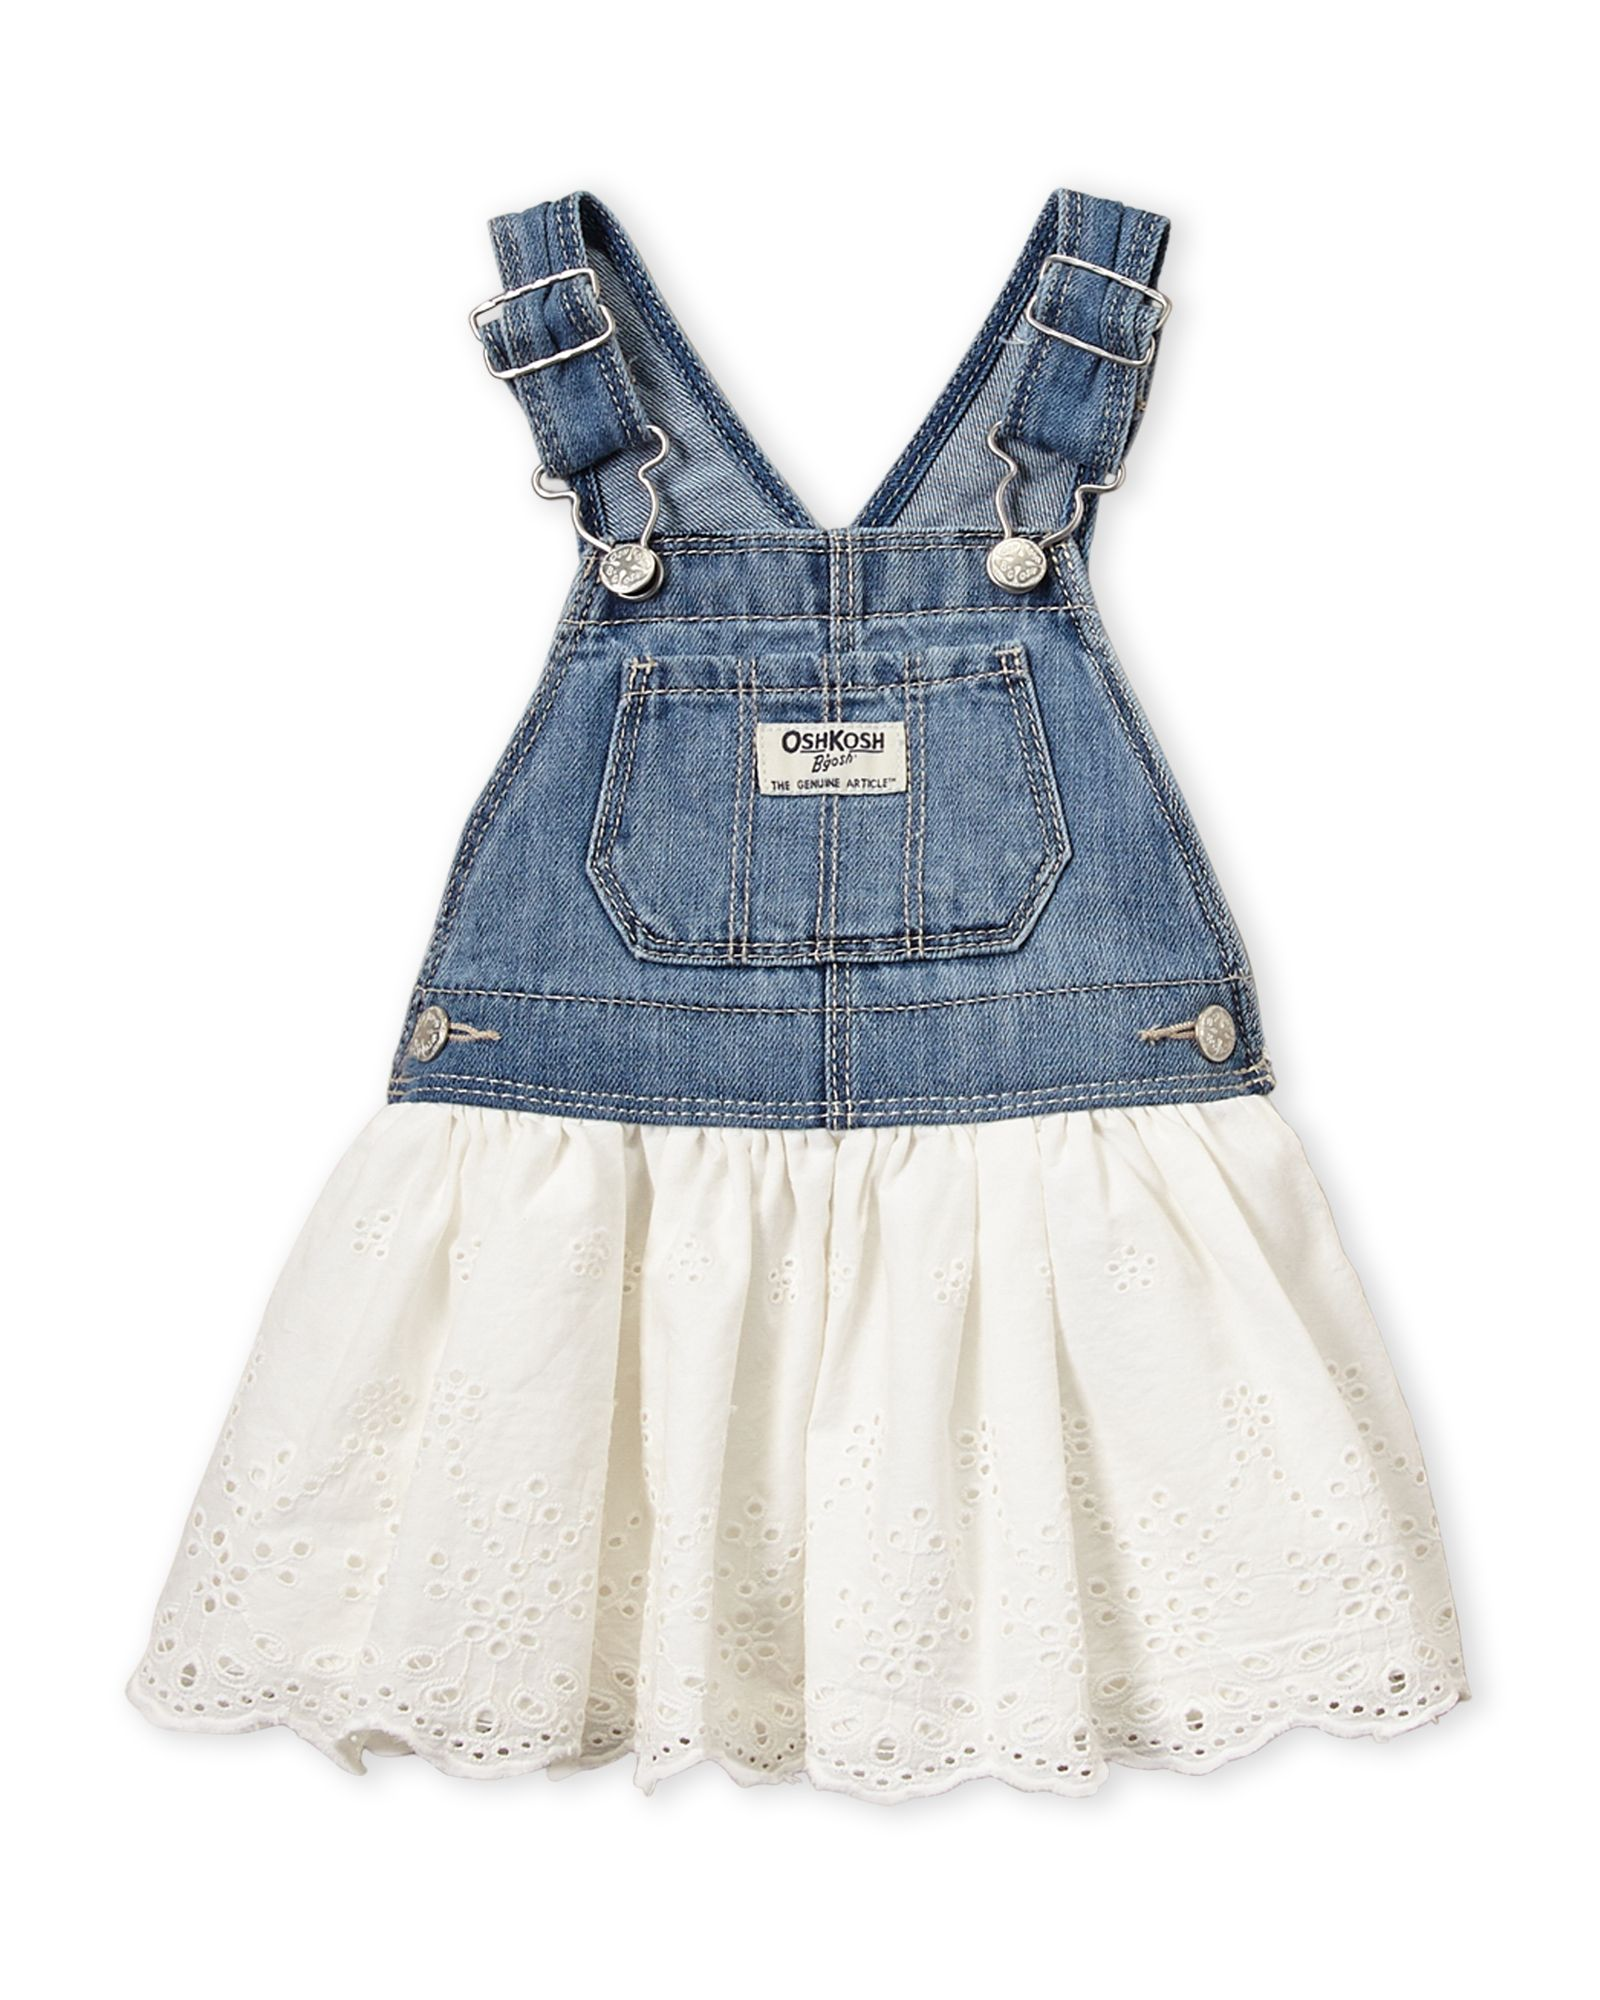 OshKosh B/'Gosh Toddler Girls/' Embroidered Denim Overall Jumper NWT